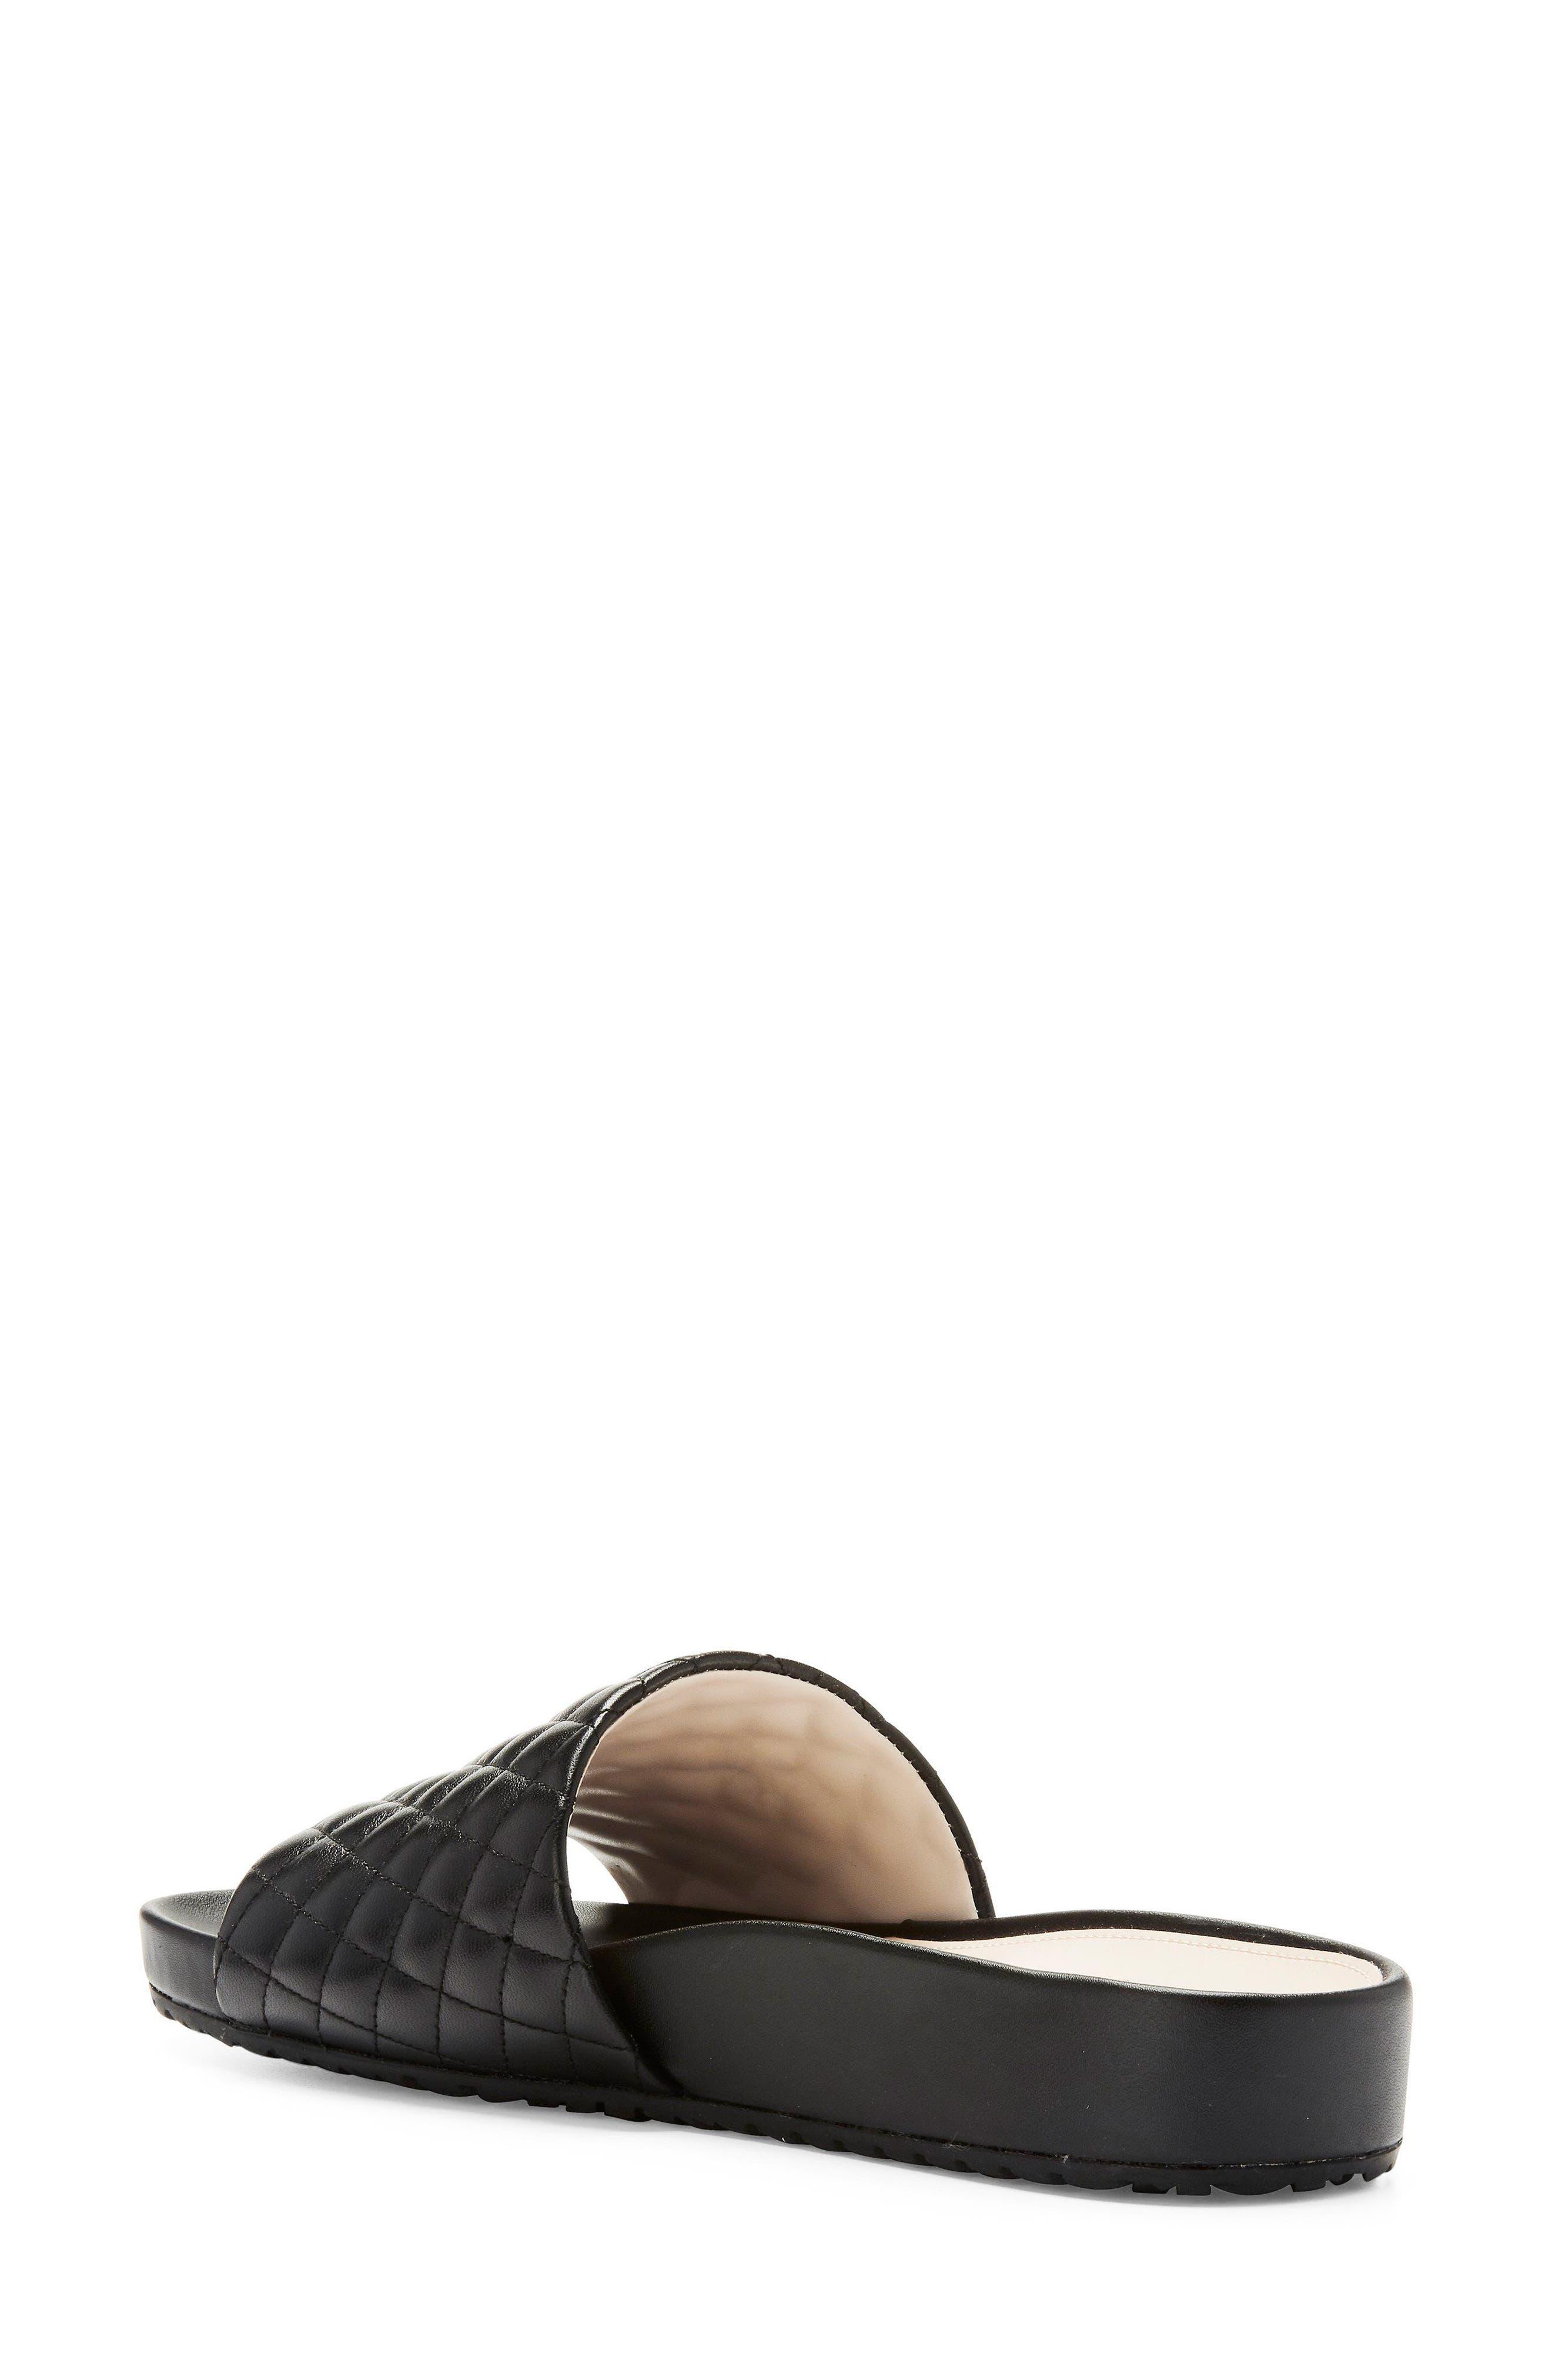 Pinch Montauk Slide Sandal,                             Alternate thumbnail 2, color,                             Black Quilted Leather